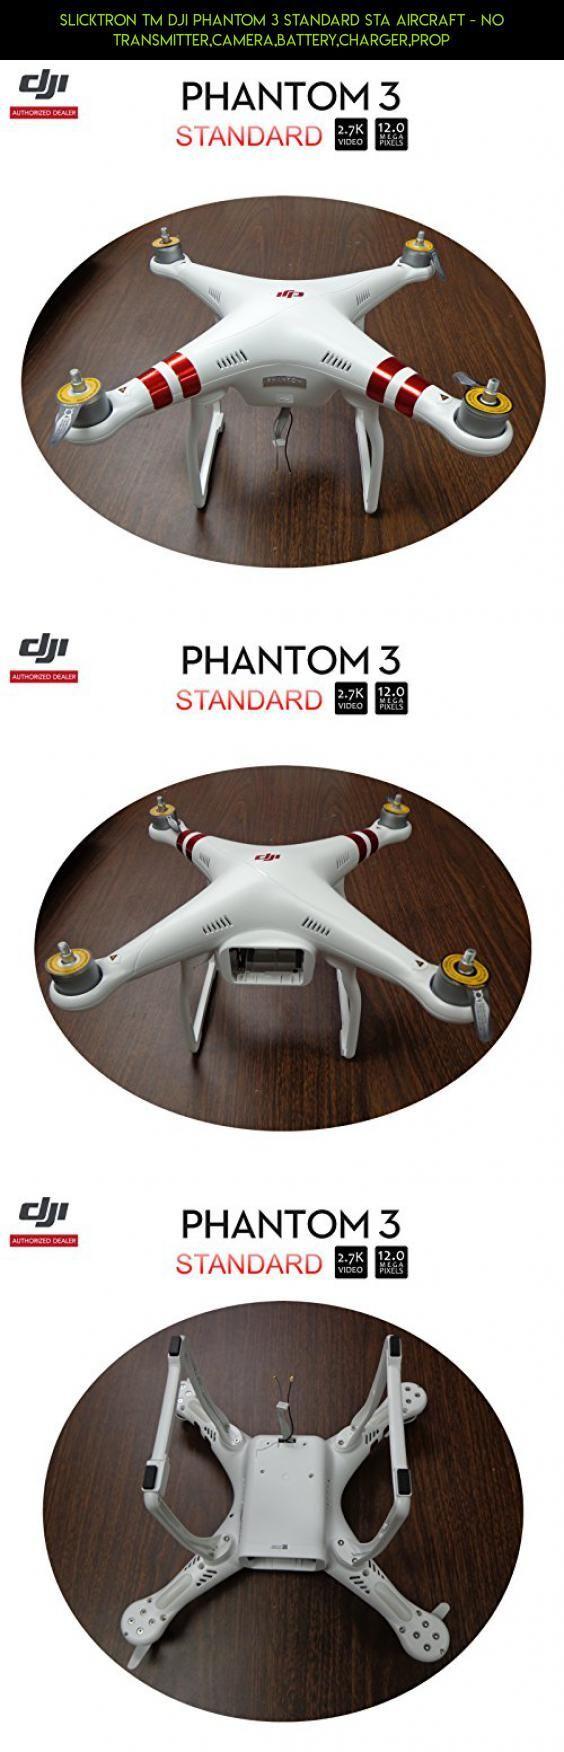 Slicktron TM DJI Phantom 3 Standard STA Aircraft - No Transmitter,Camera,Battery,Charger,Prop #technology #products #aircraft #camera #tech #racing #plans #parts #fpv #shopping #gadgets #standard #dji #drone #kit #phantom #3 #quadcopter